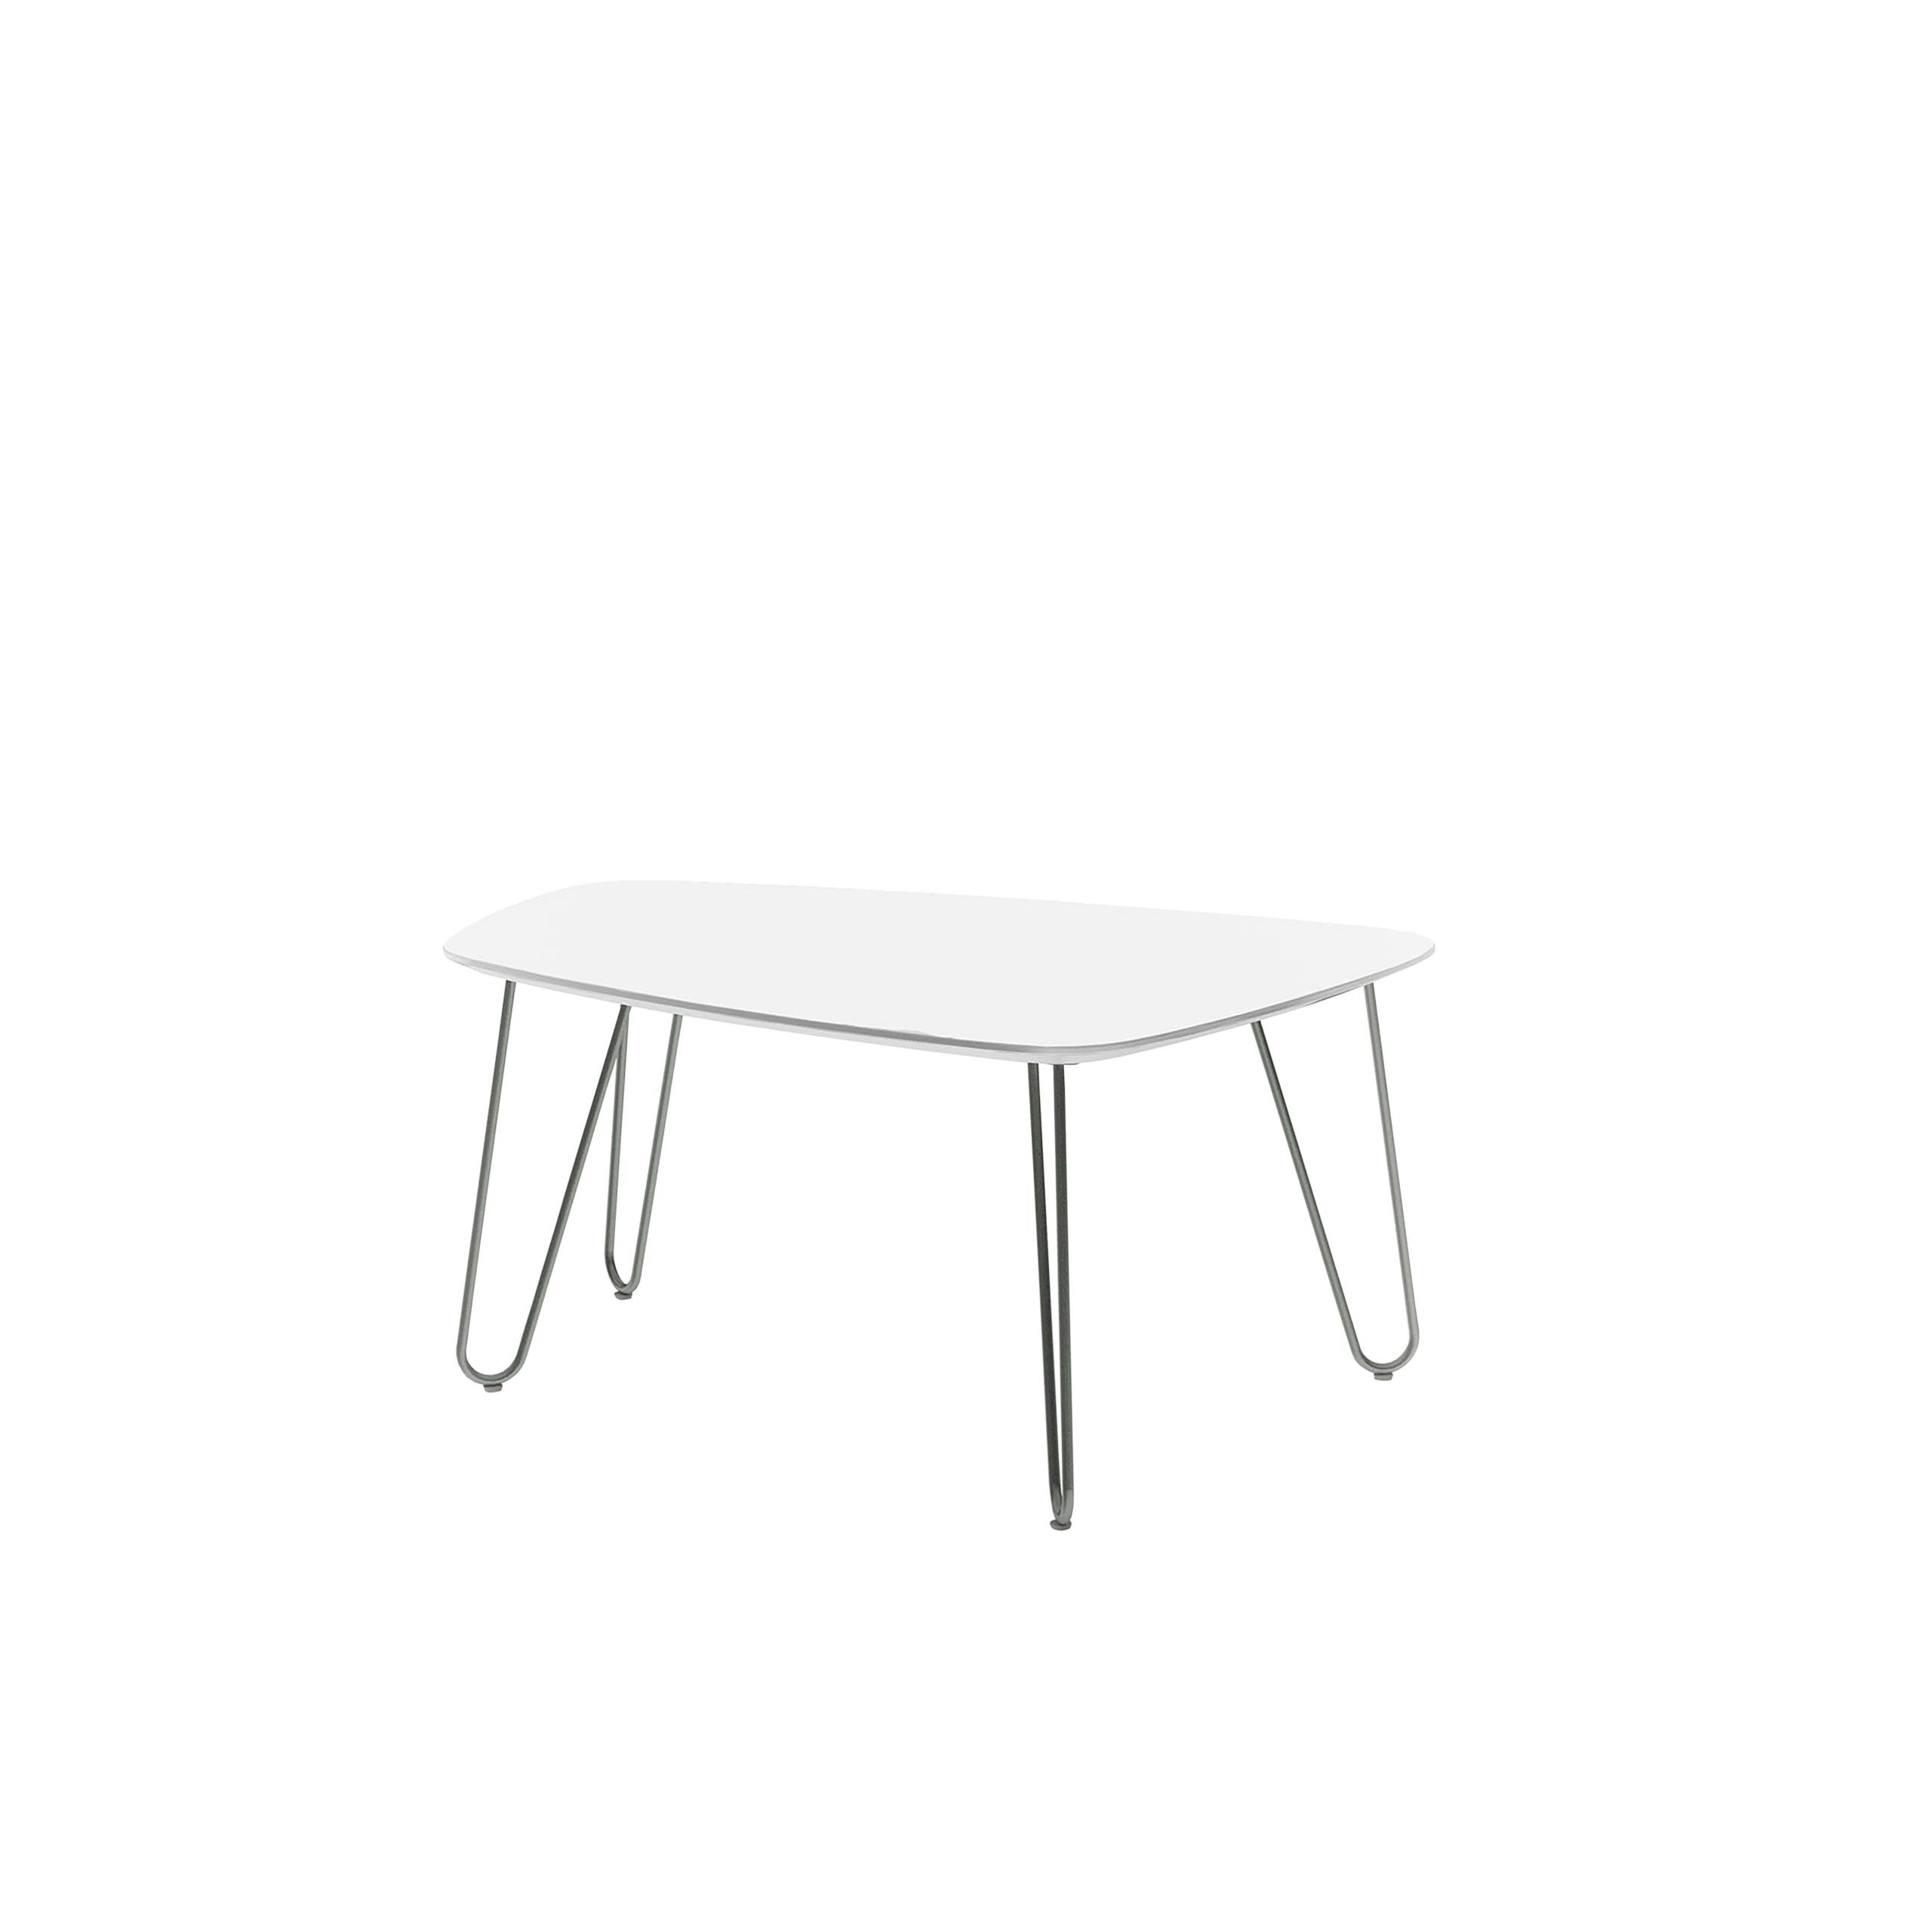 Mongezi Loungebord produktbild 2